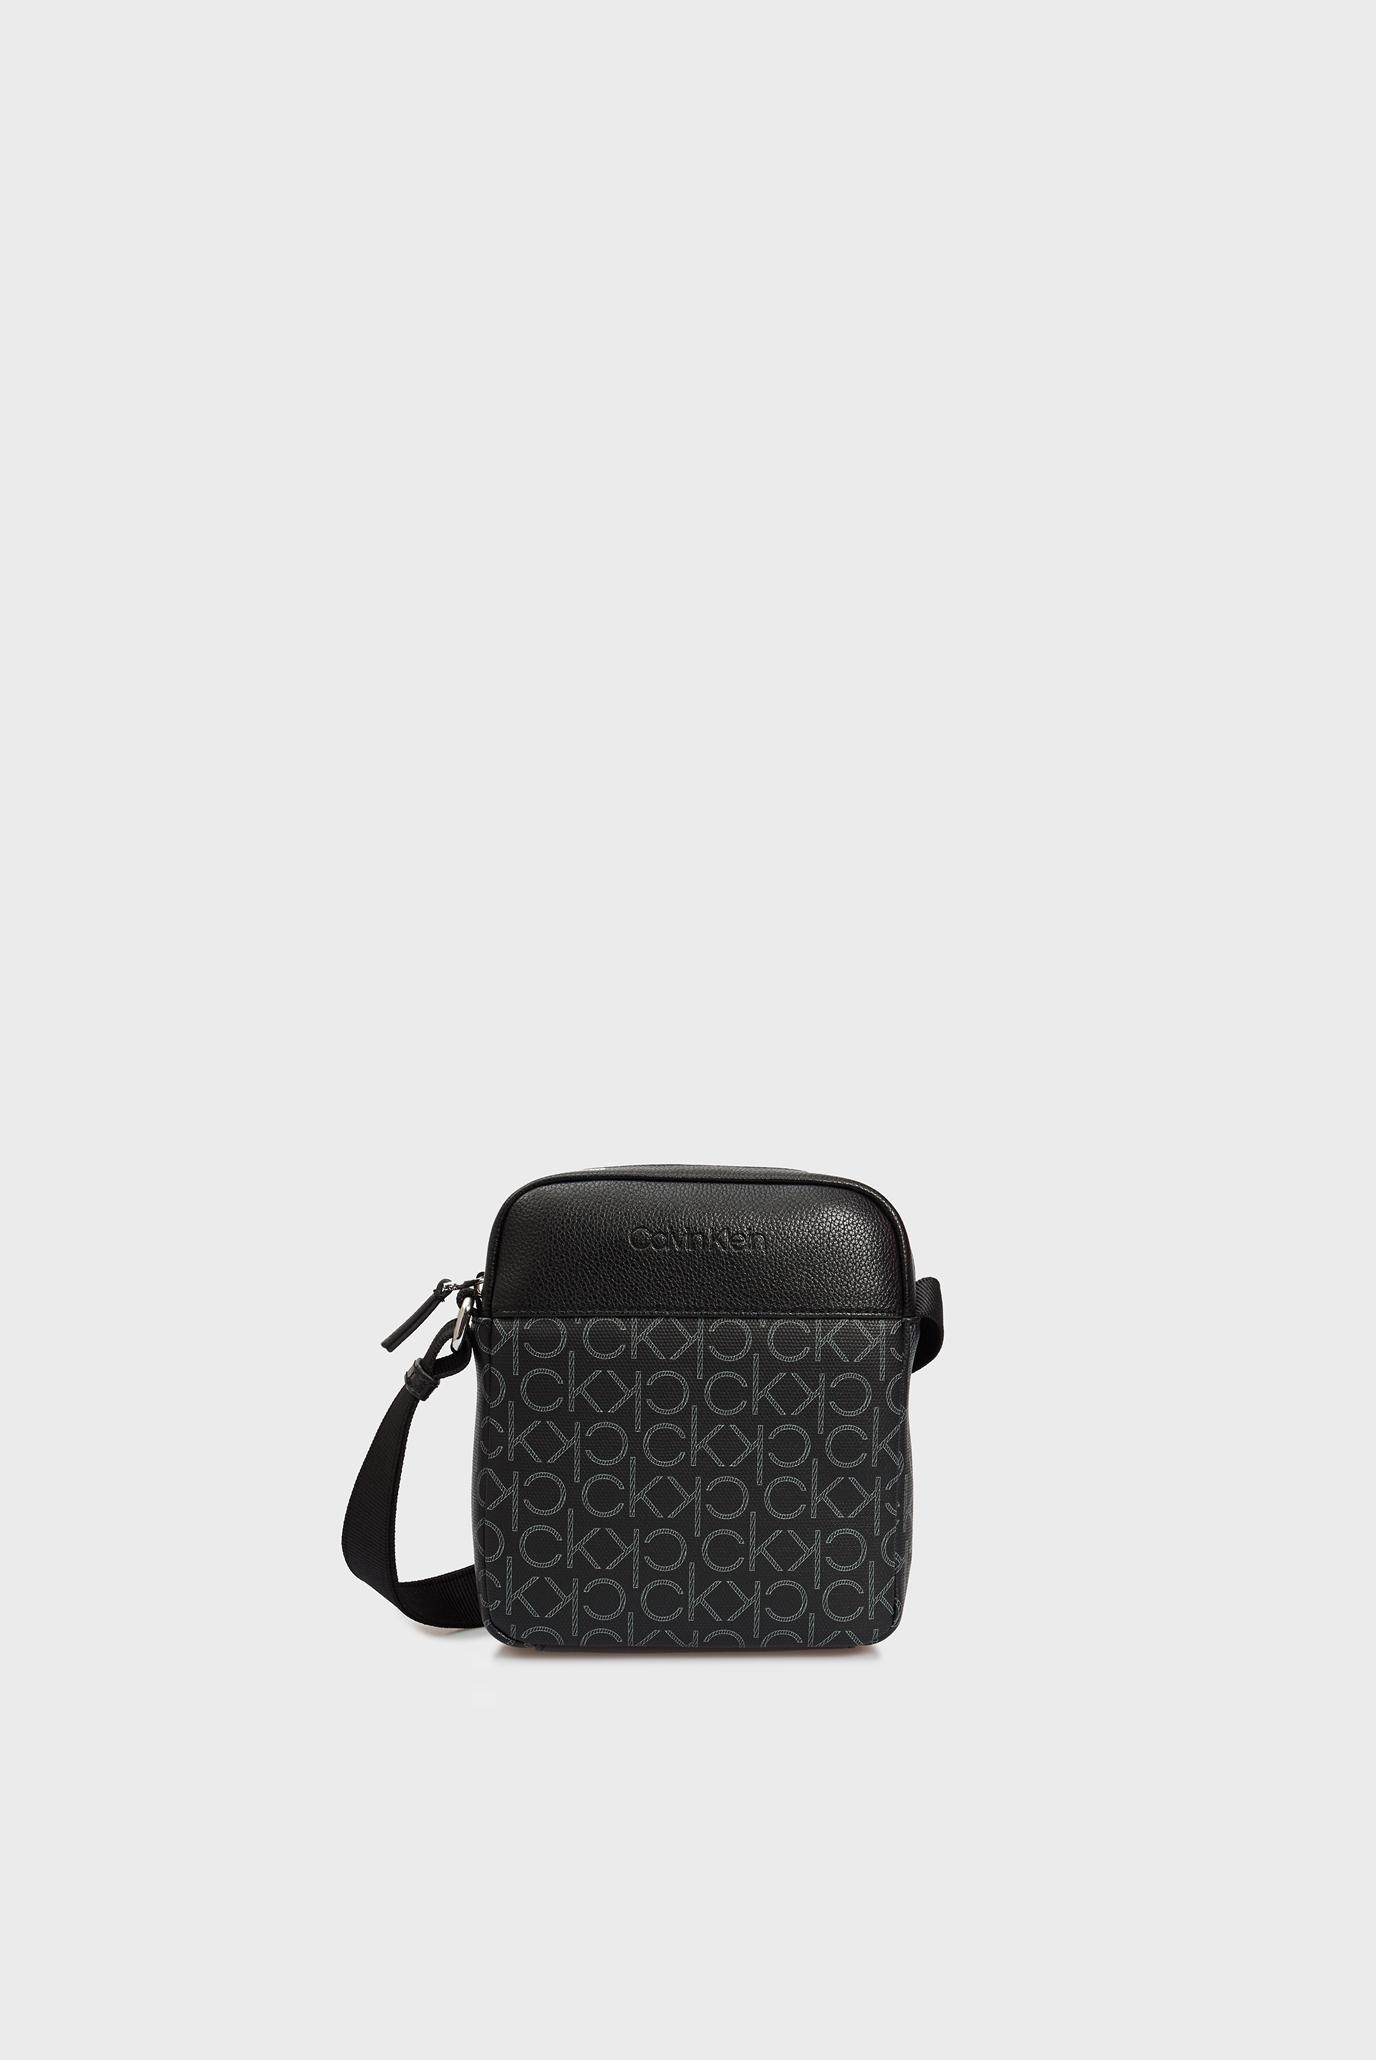 Мужская черная сумка REPORTER S 1